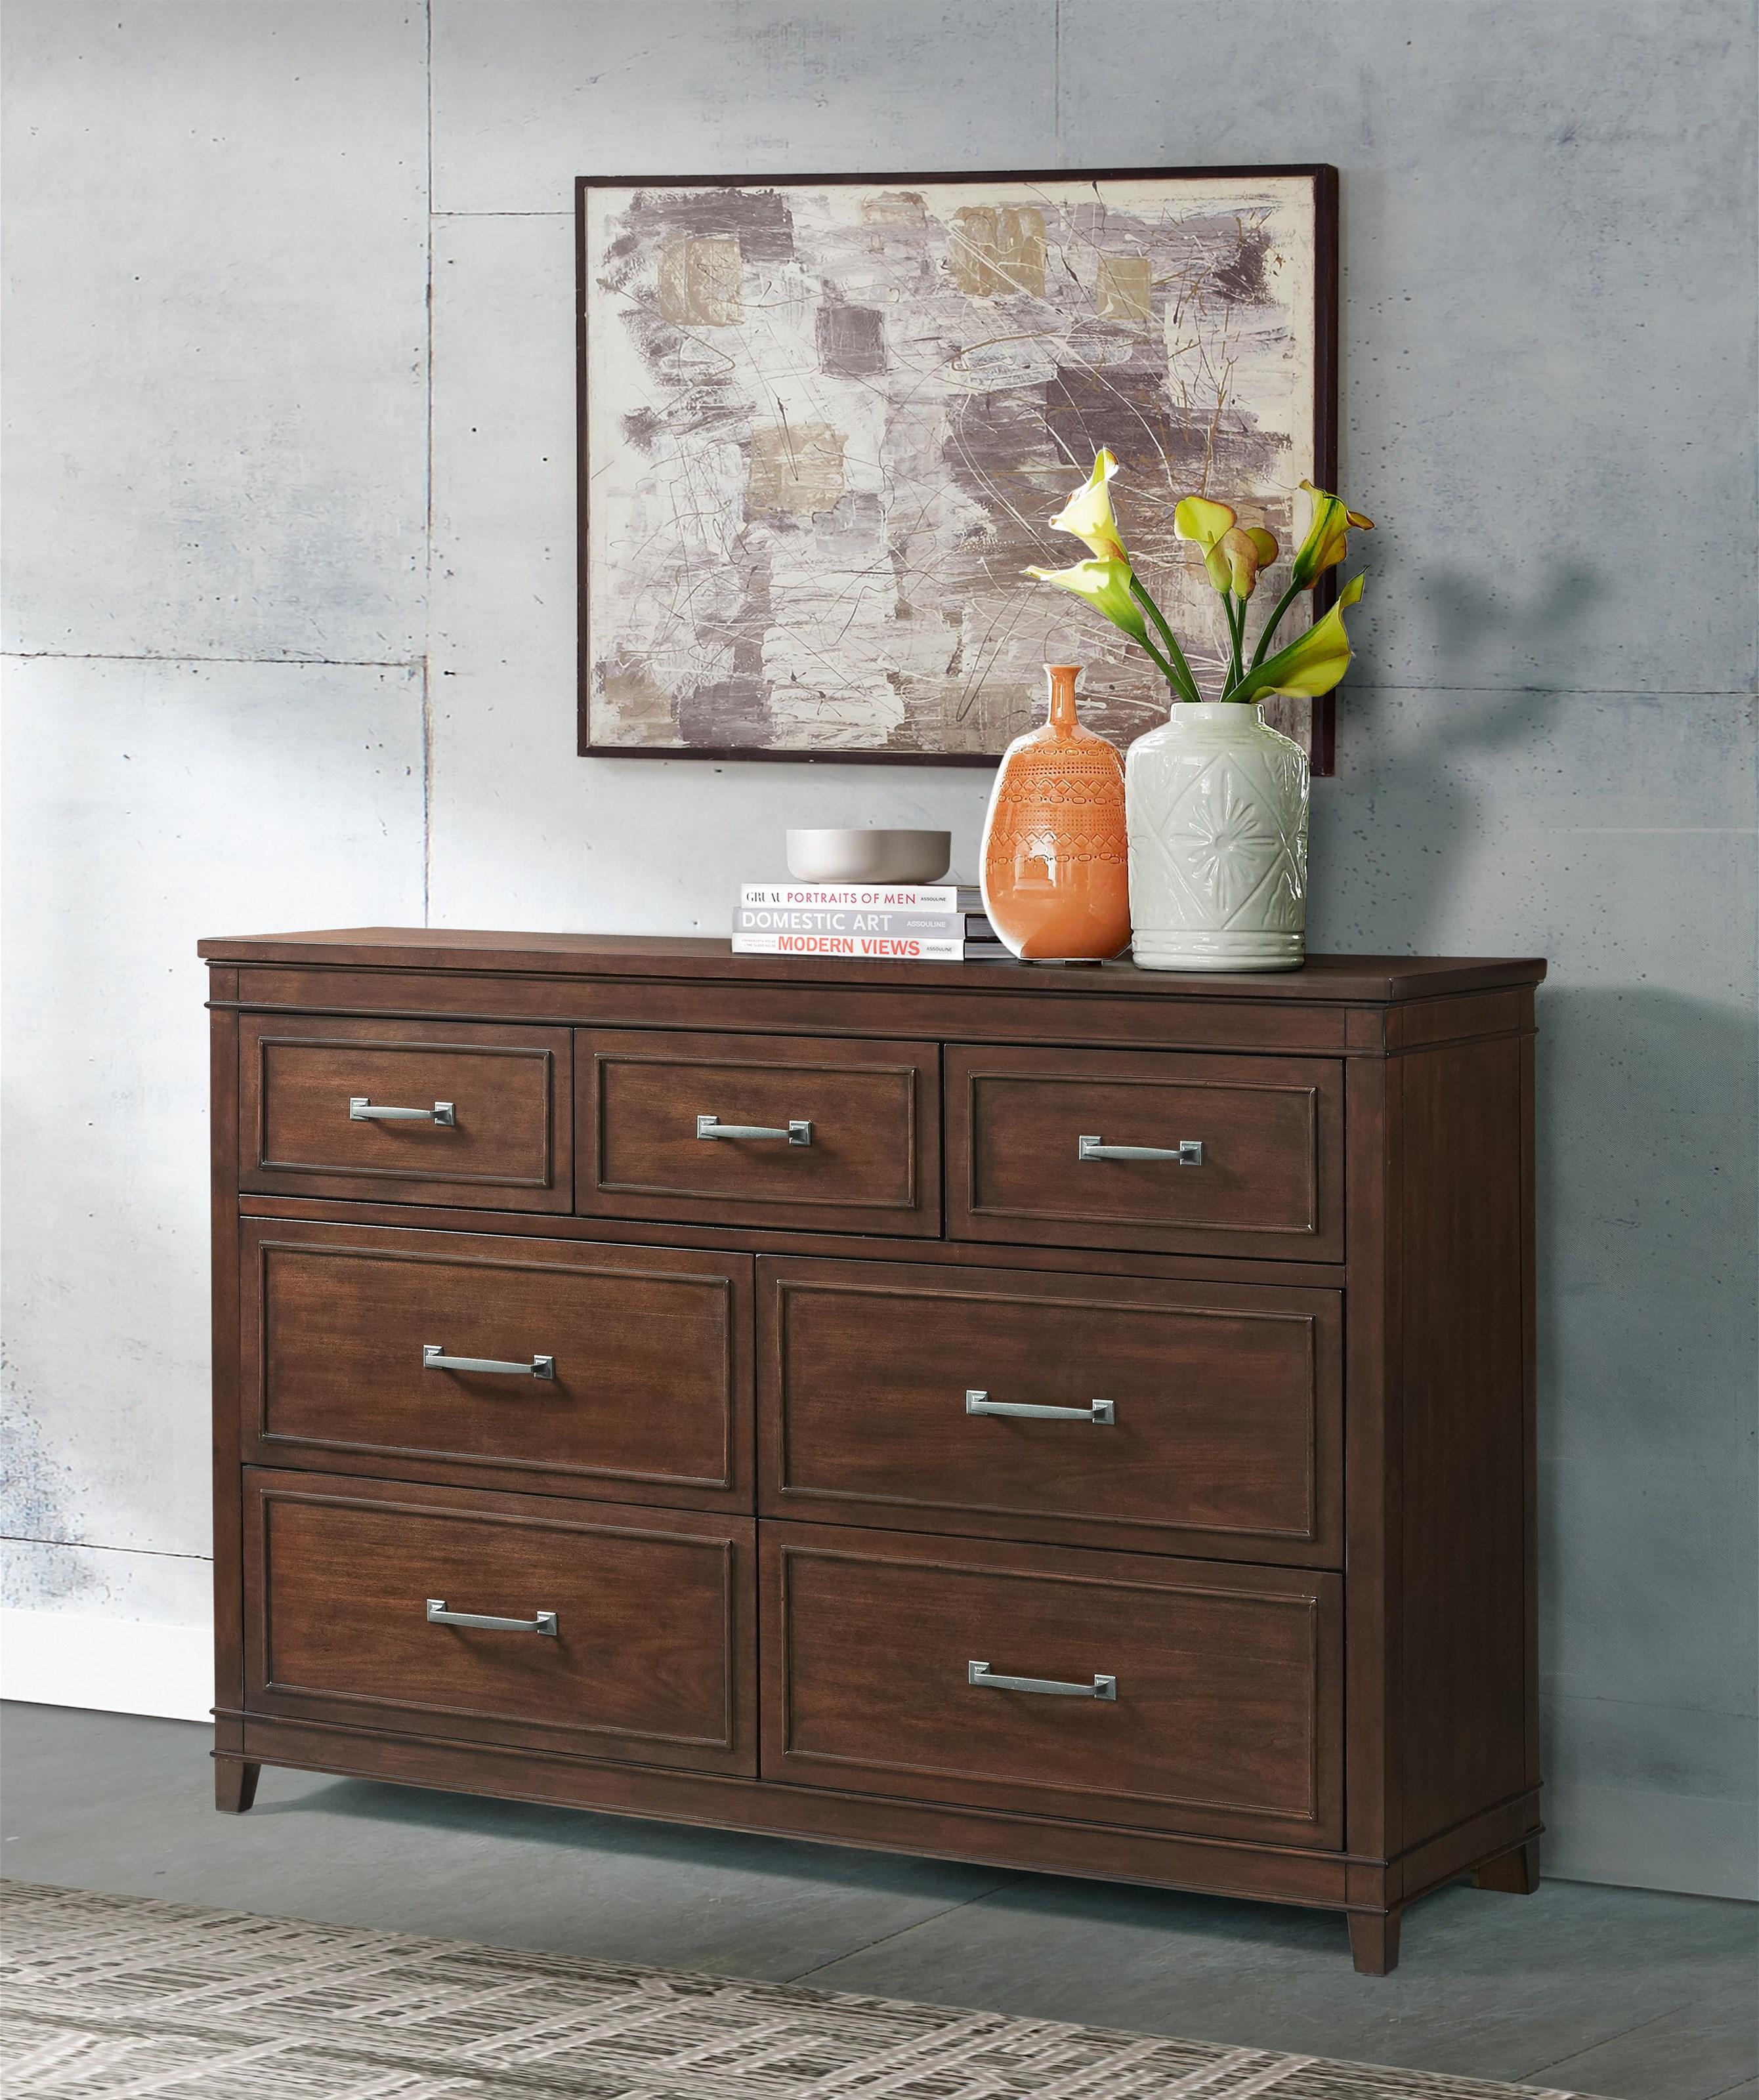 LaJolla Dresser by Martin Svensson Home at Darvin Furniture